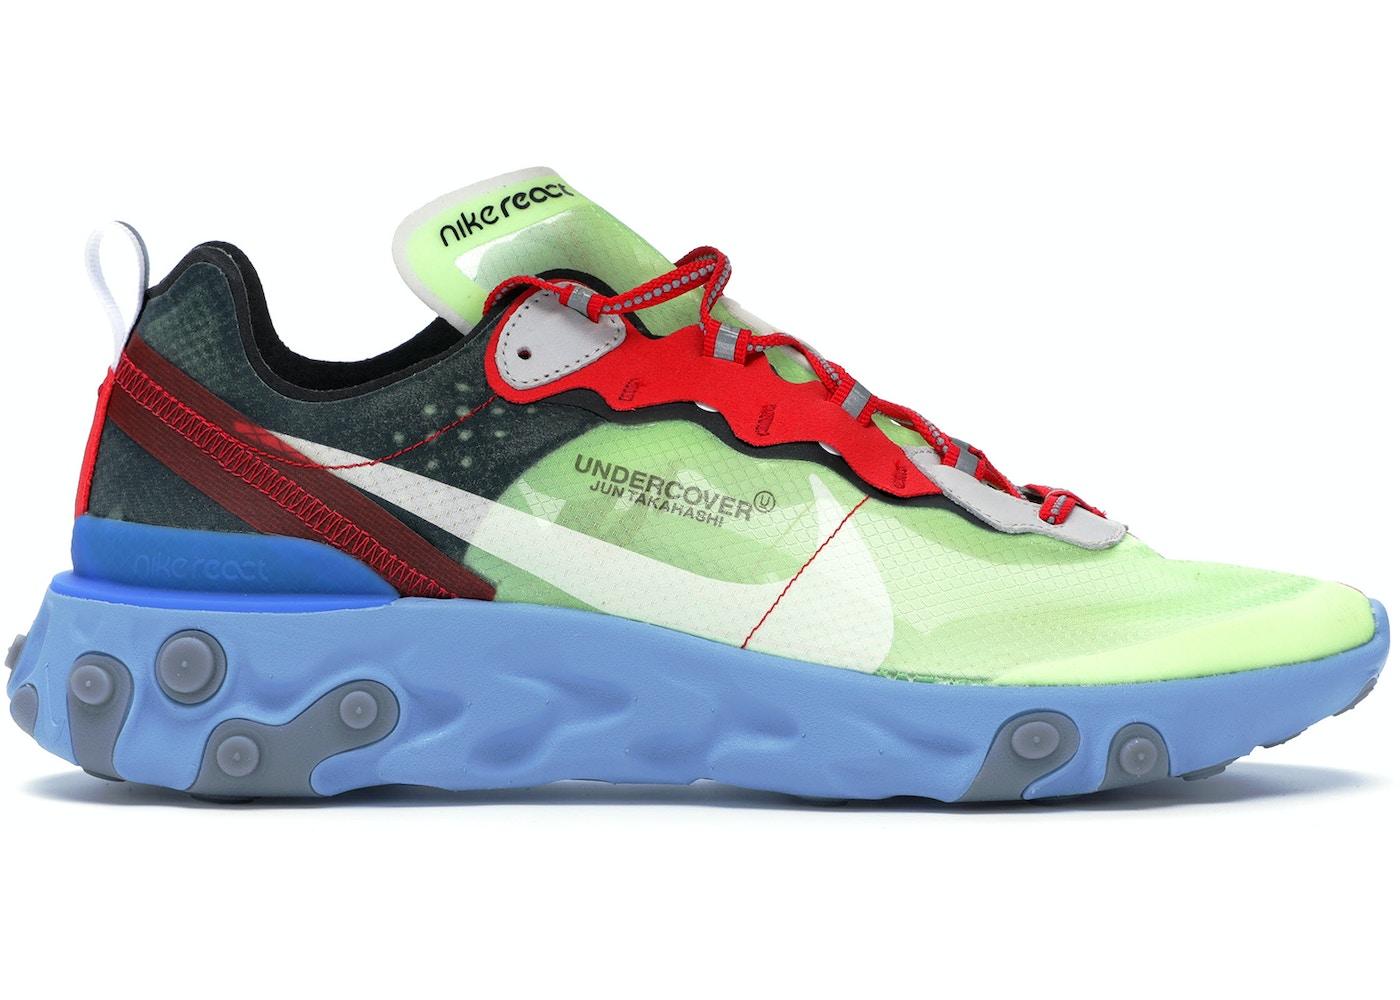 d12de6347d45 Nike React Element 87 Undercover Volt - BQ2718-700